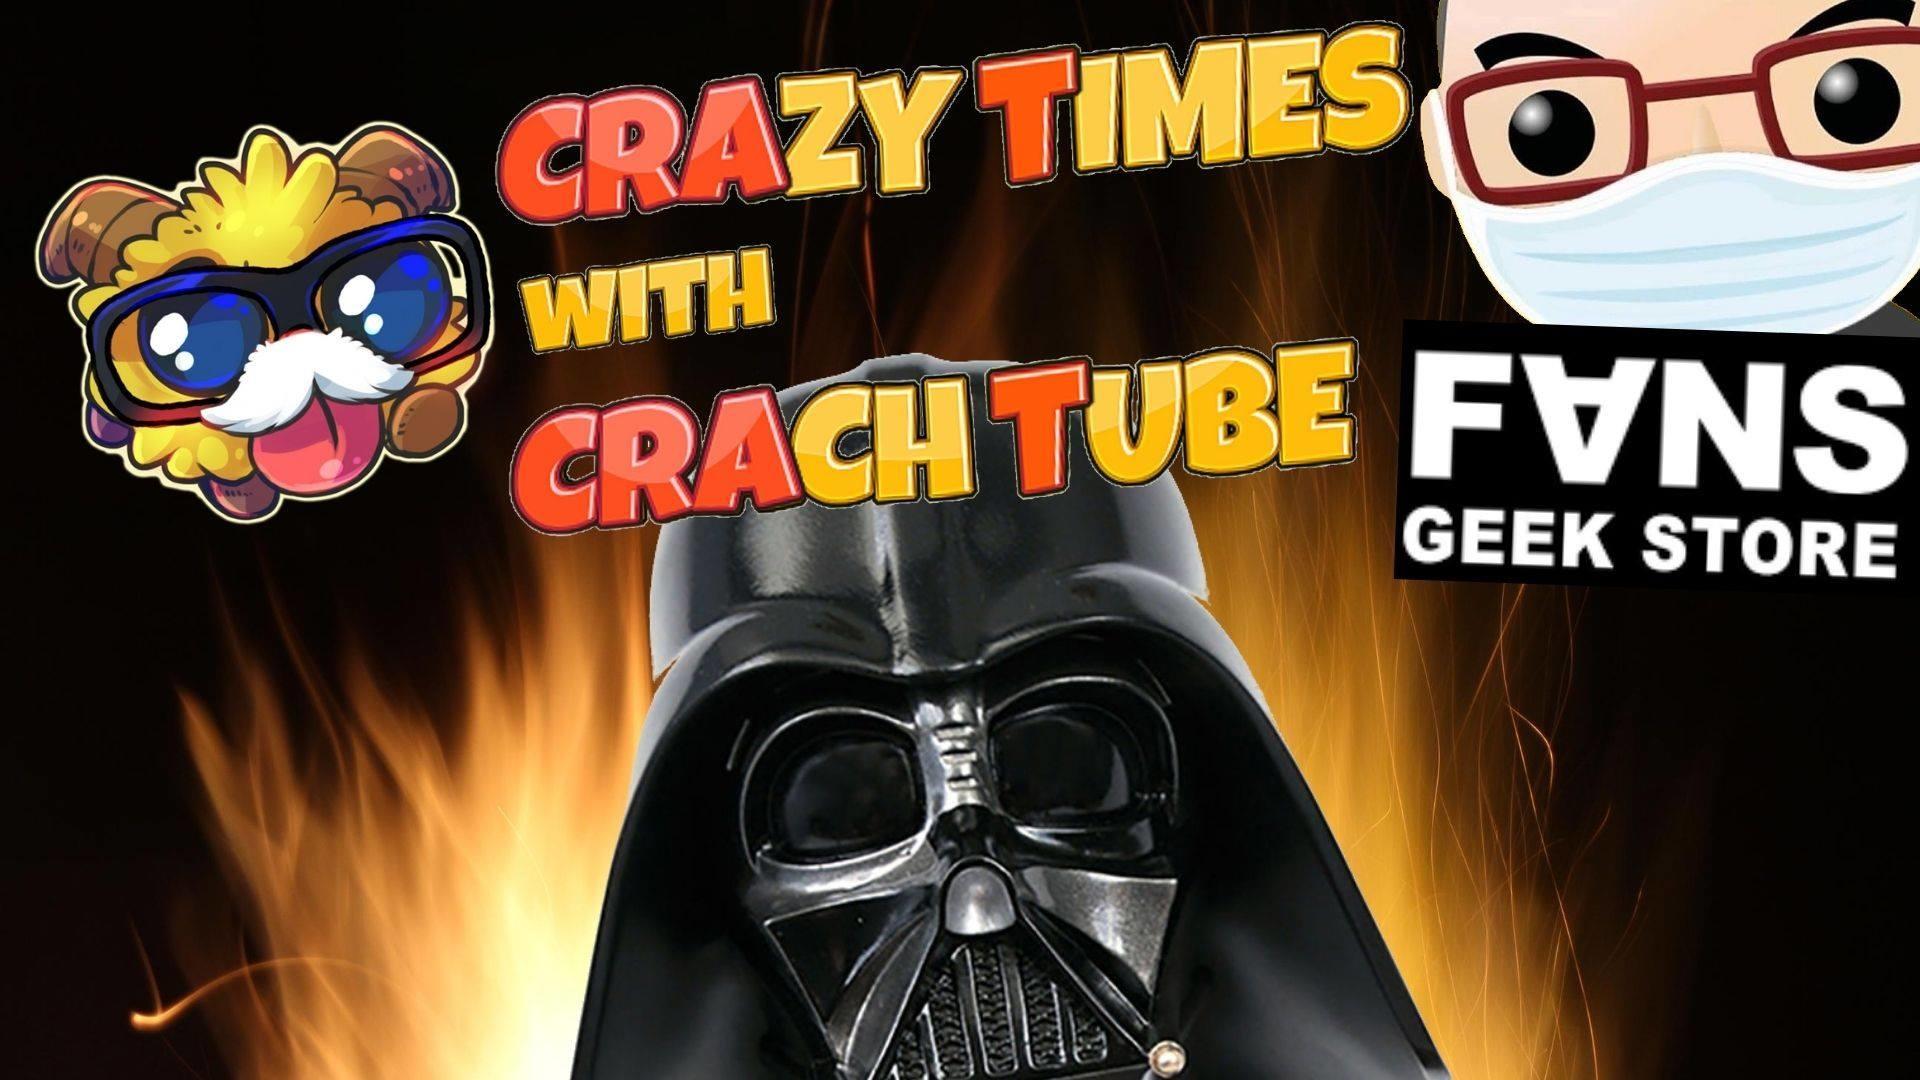 FANS @ Crach Tube